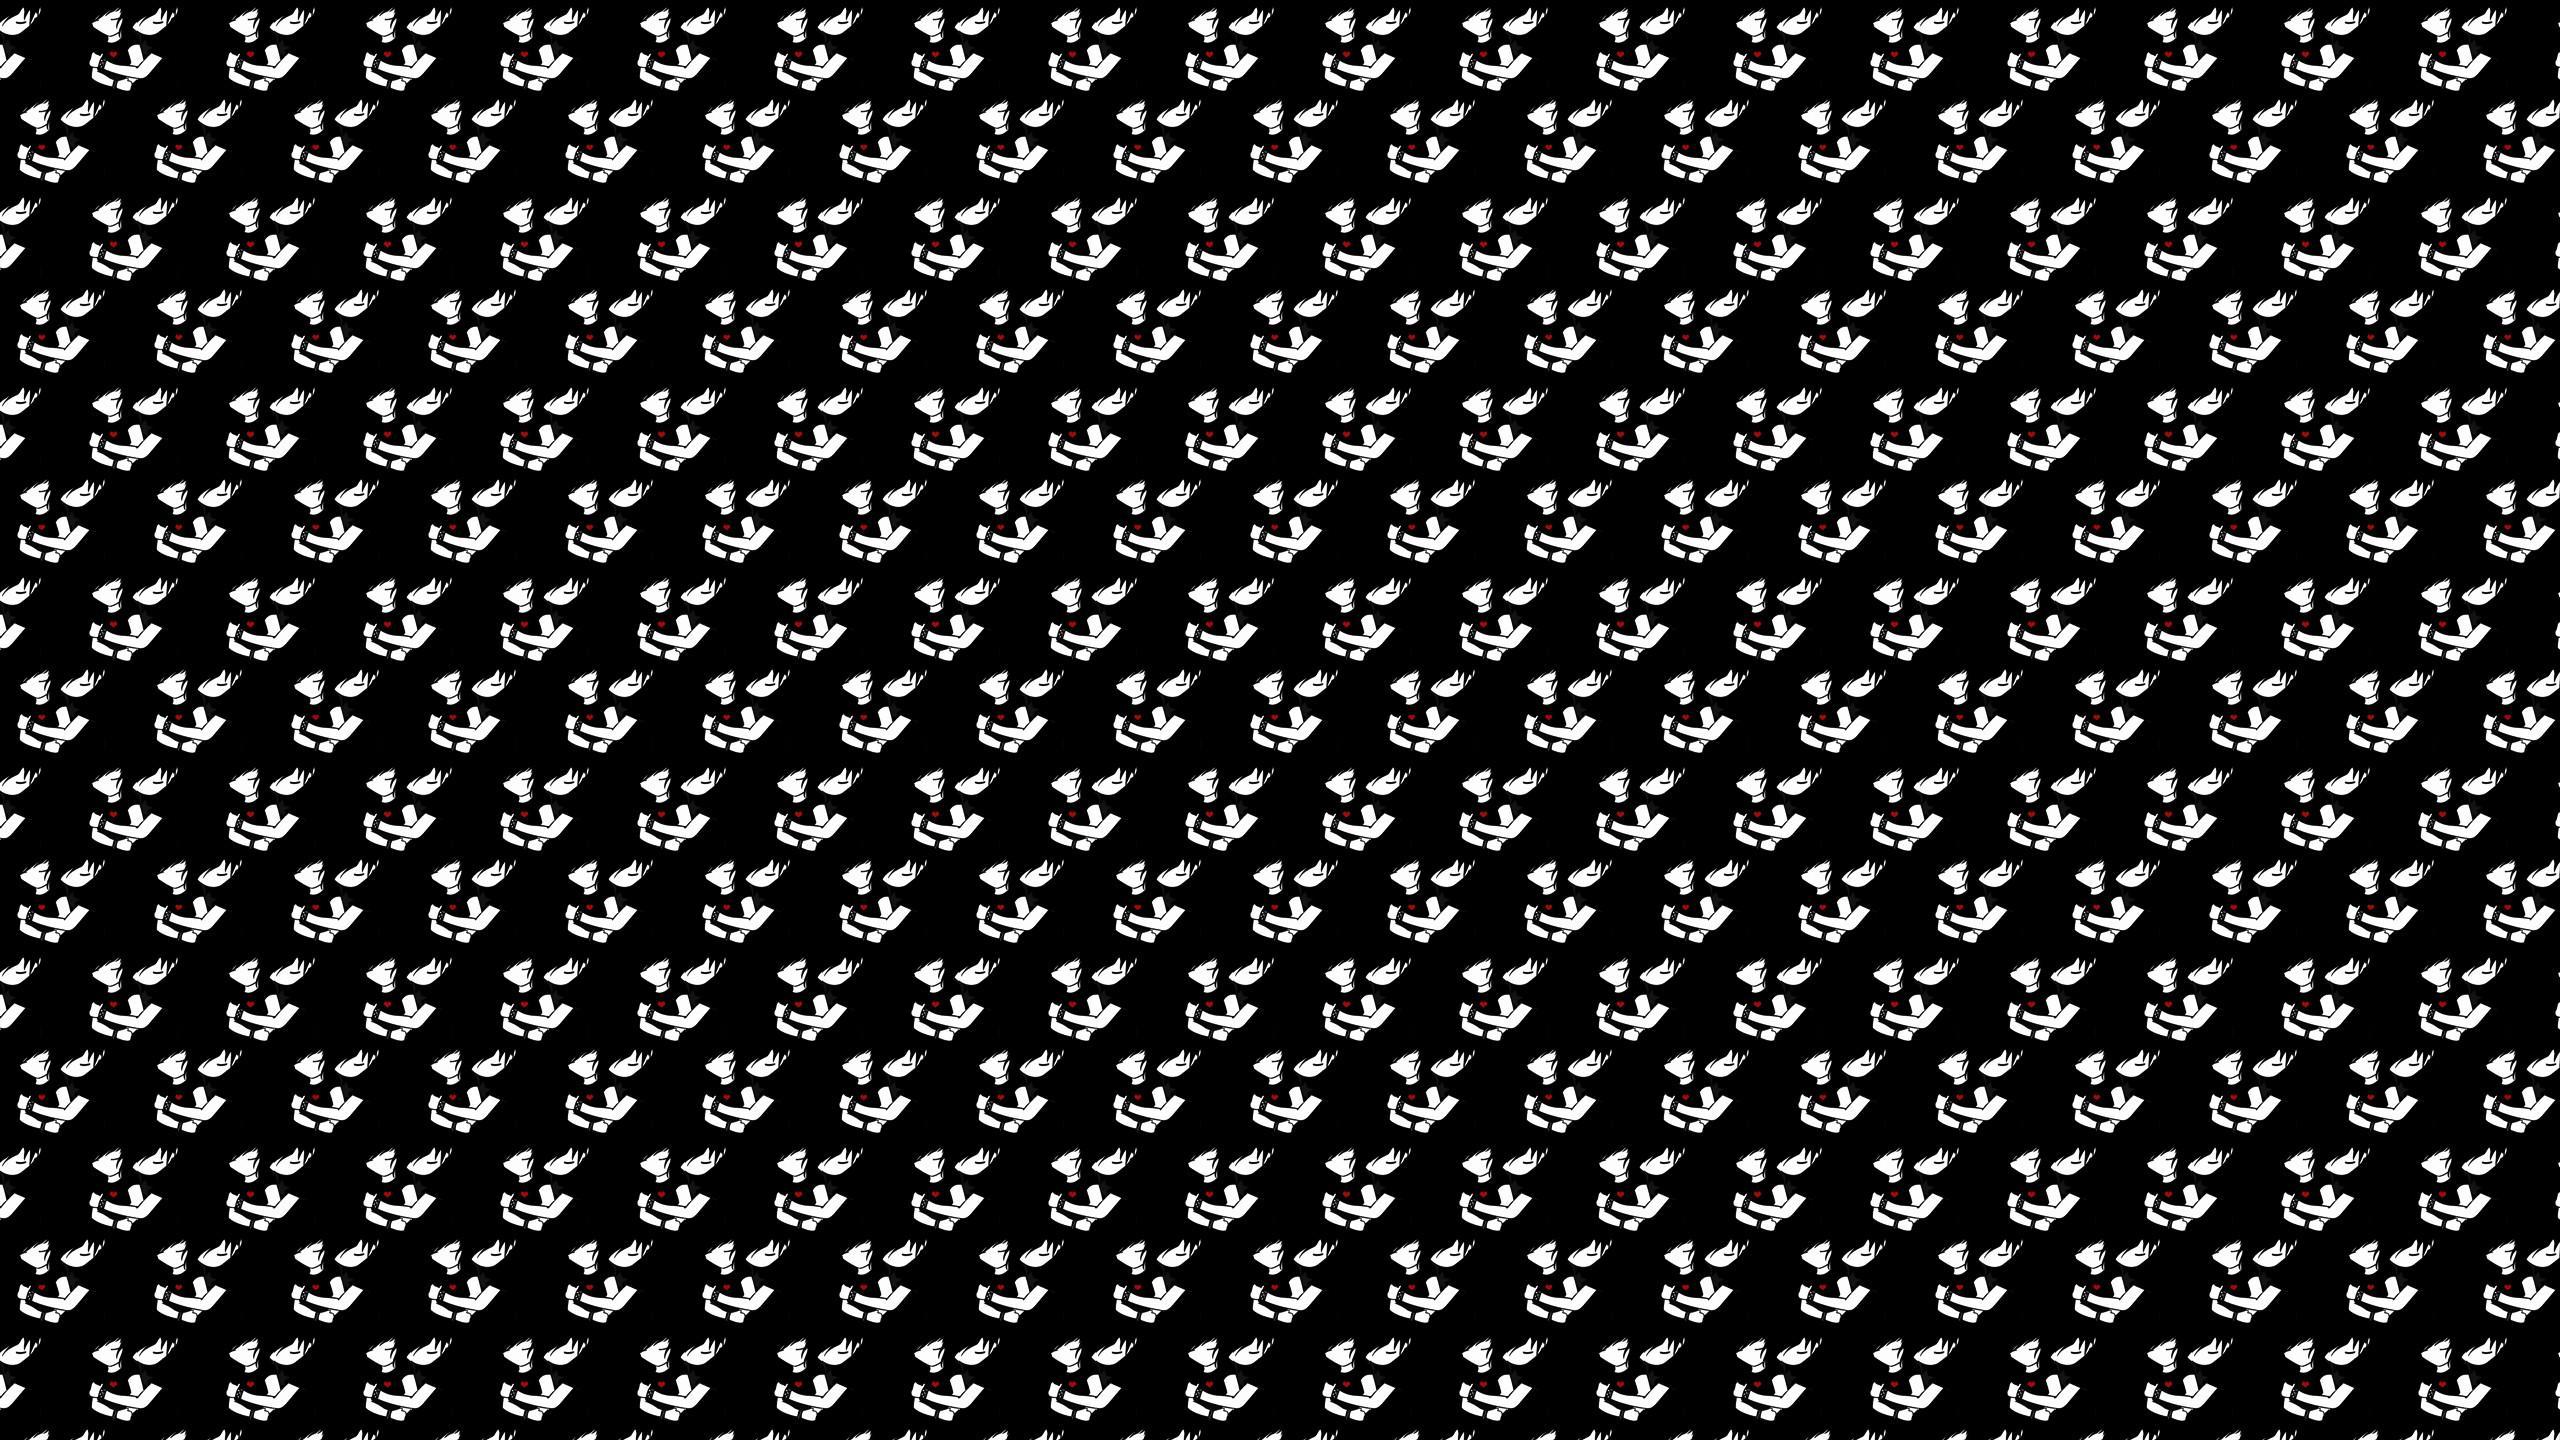 Tumblr Emo Desktop Wallpapers   Top Tumblr Emo Desktop 2560x1440